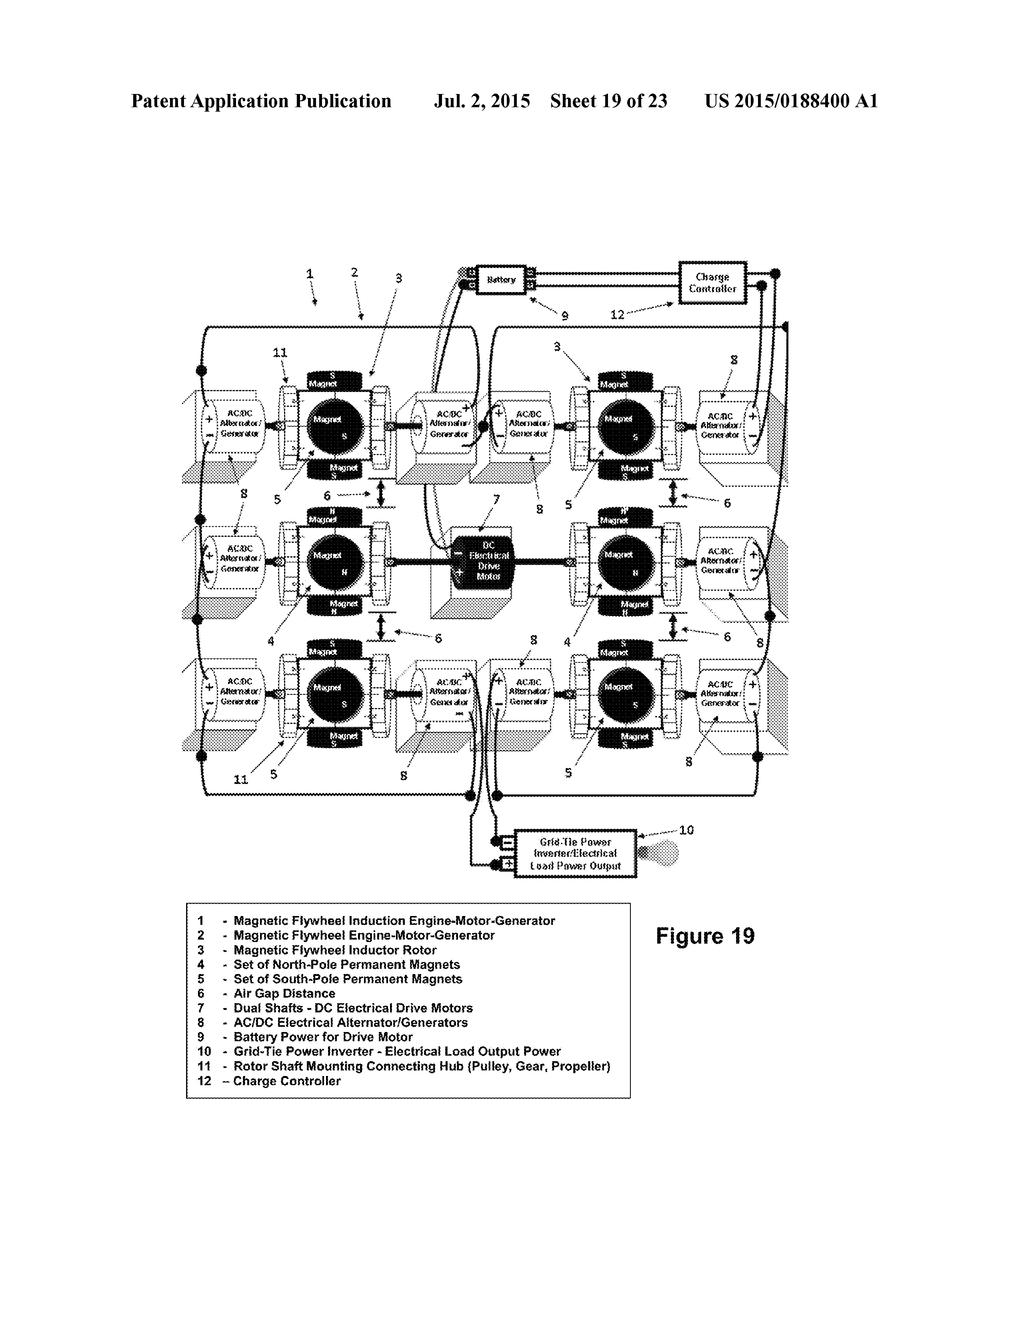 magnetic flywheel induction engine motor generator diagram force field diagram magnetic flywheel induction engine motor generator diagram, schematic, and image 20